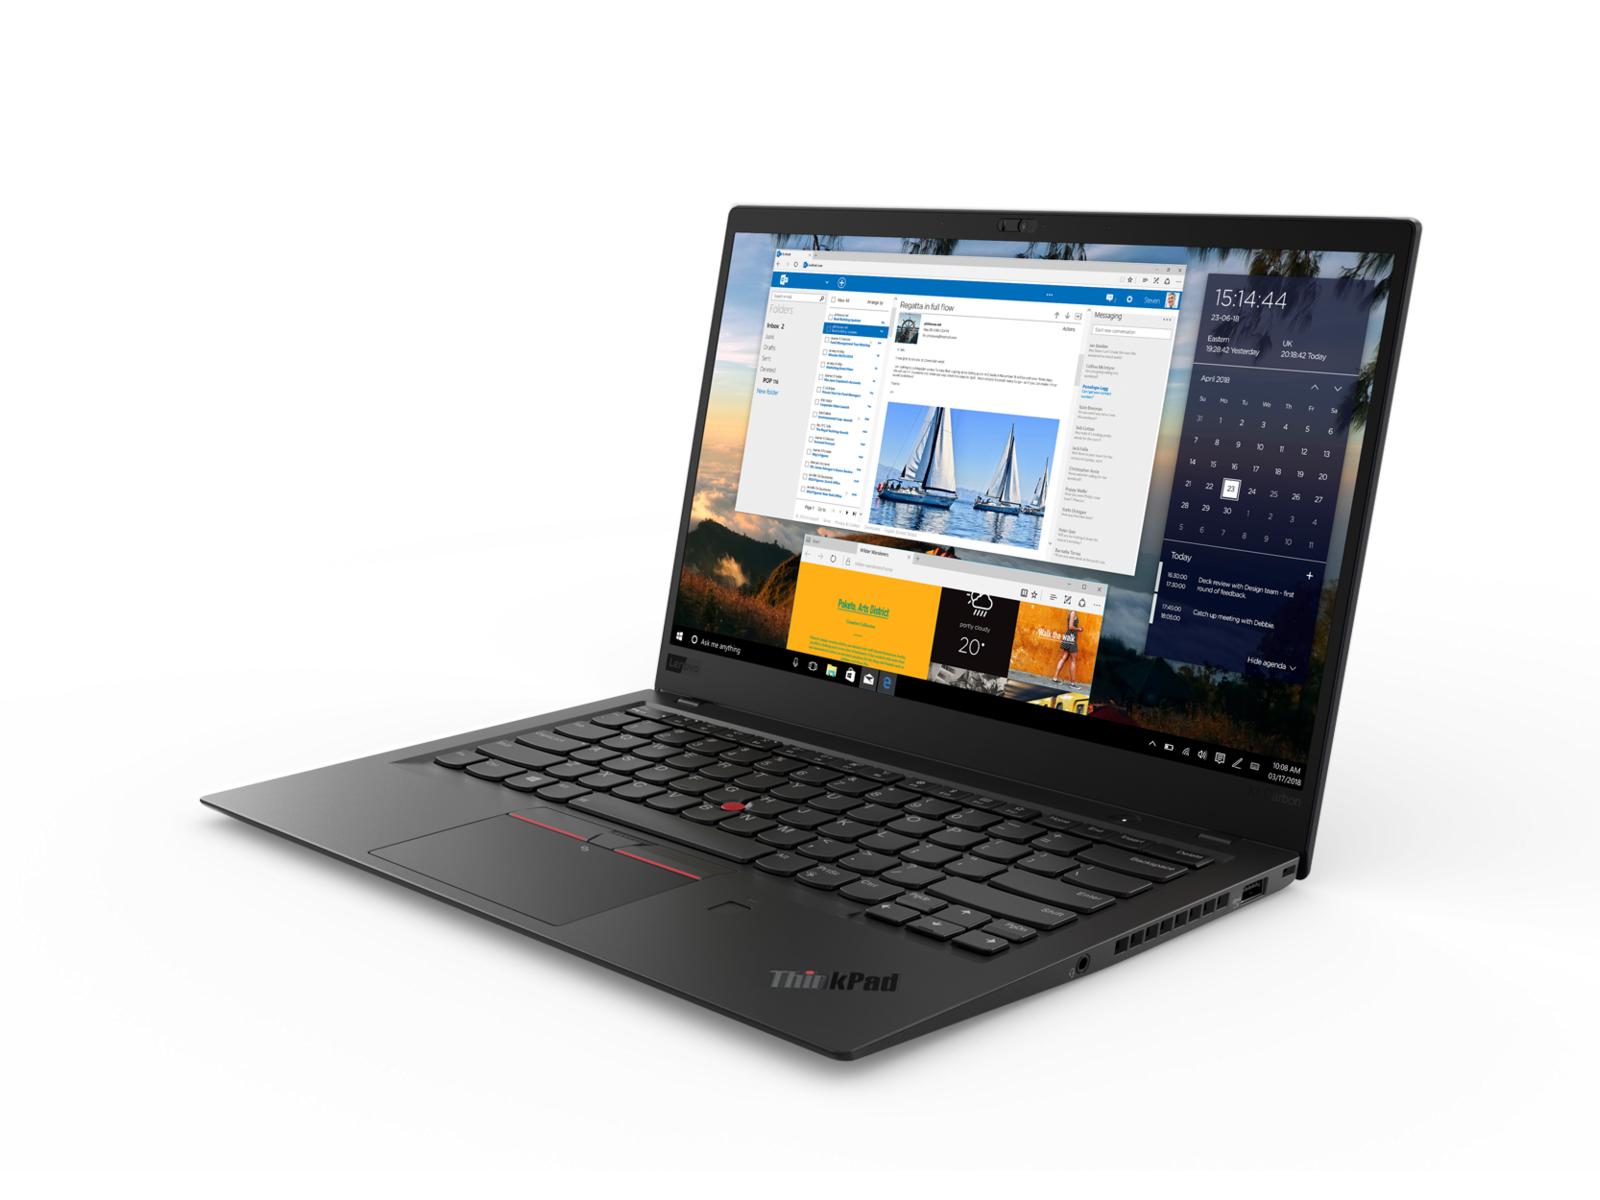 Lenovo ThinkPad X1 Carbon G6 [20KHS0C400] Intel i7-8650U vPro/16GB/512GB-SSD/14inFHD/4G LTE/Win10Pro64/3Yr *Bonus 3 Years Onsite Warranty*